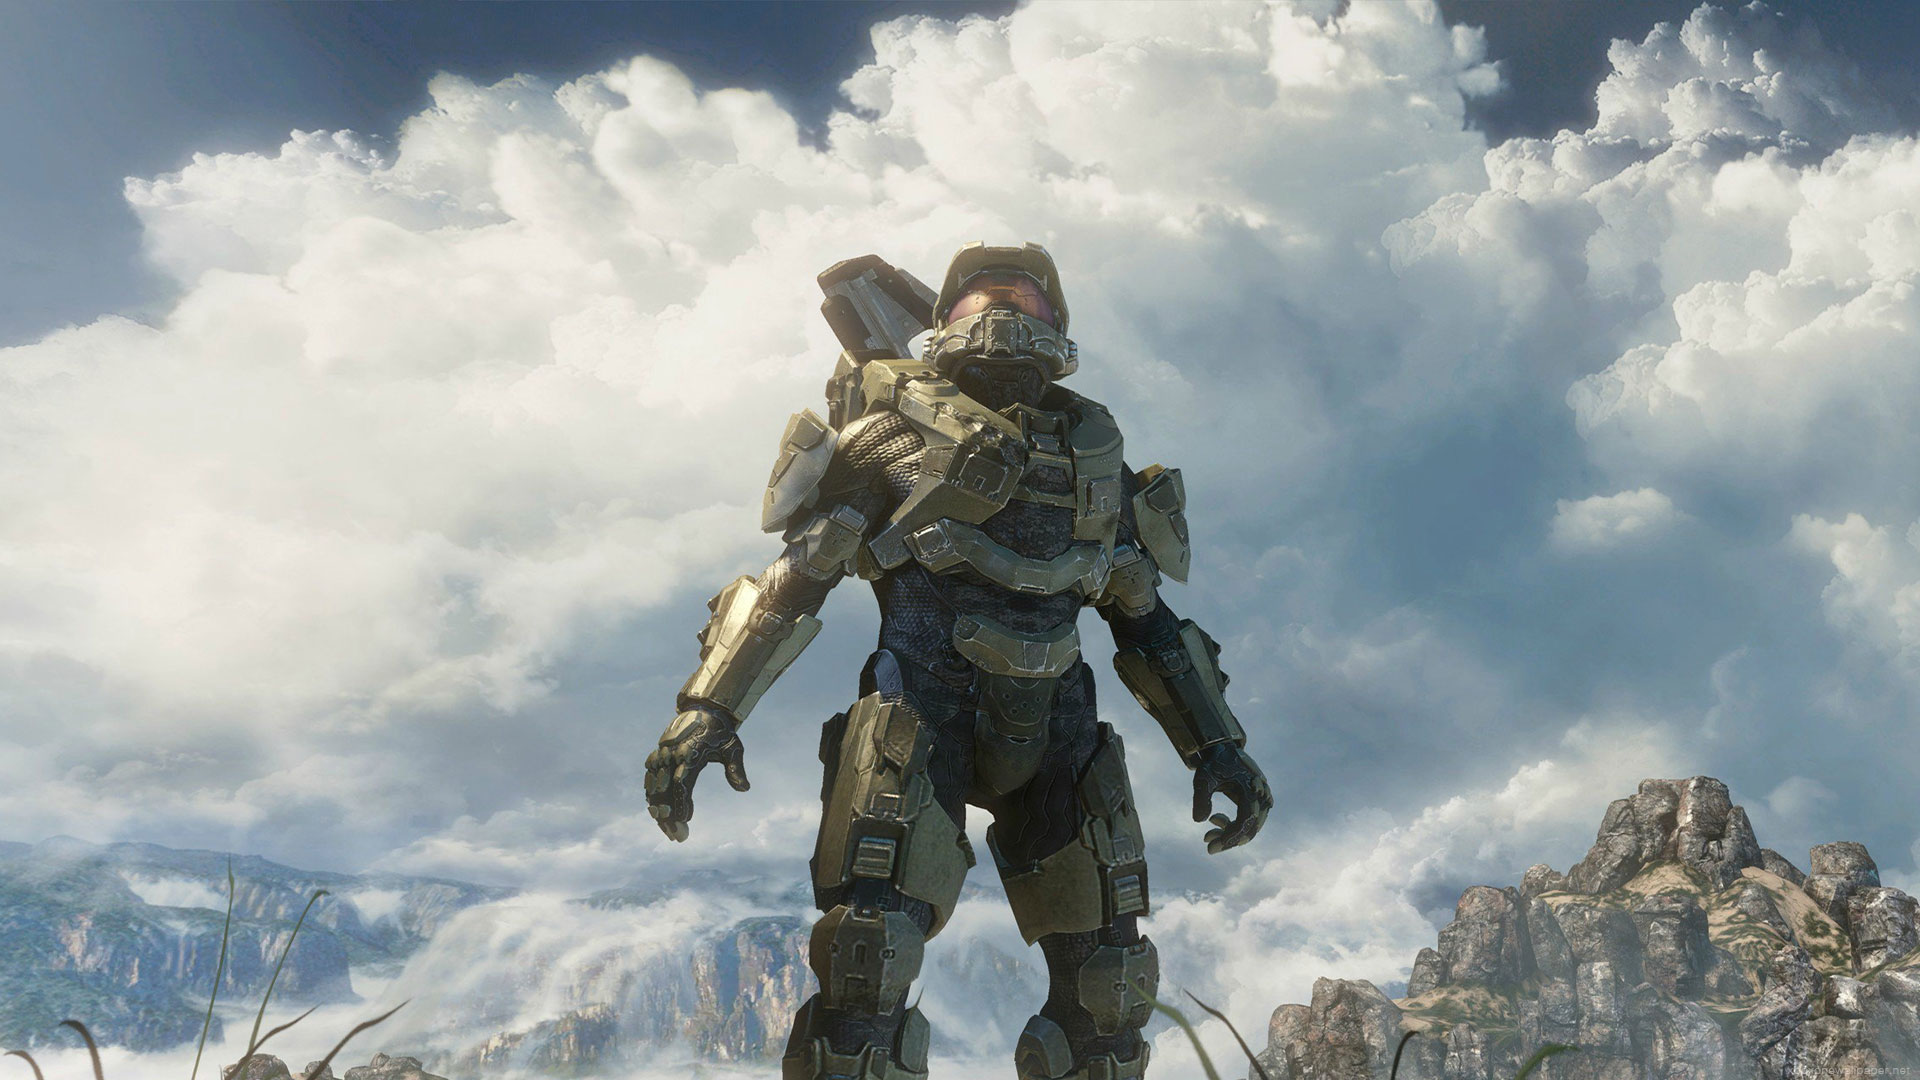 Halo 4 Master Chief Wallpaper Game HD Wallpaper 1080p 1920x1080